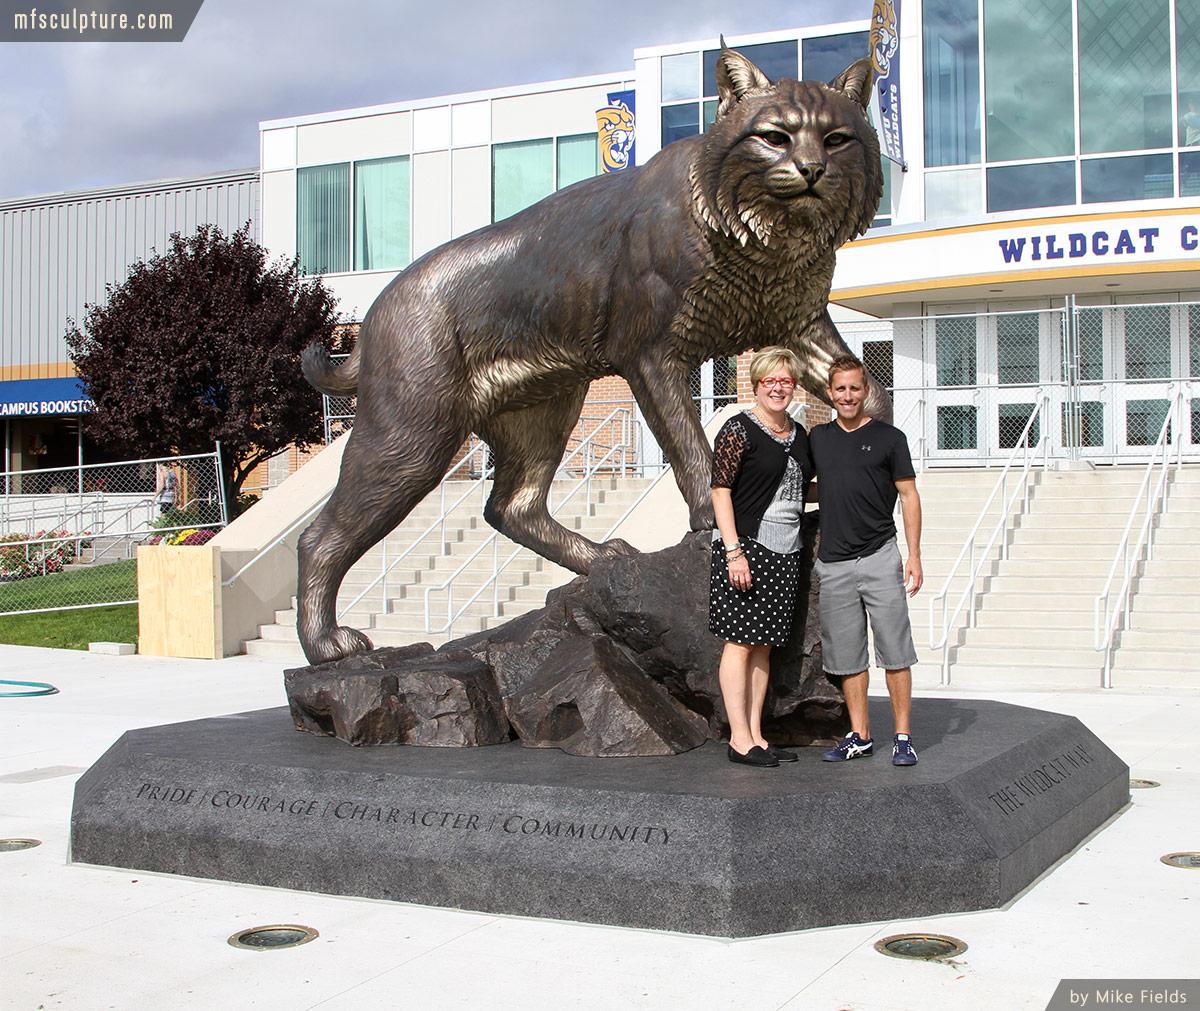 Wildcat Sculpture University Mascot Monument Art 2